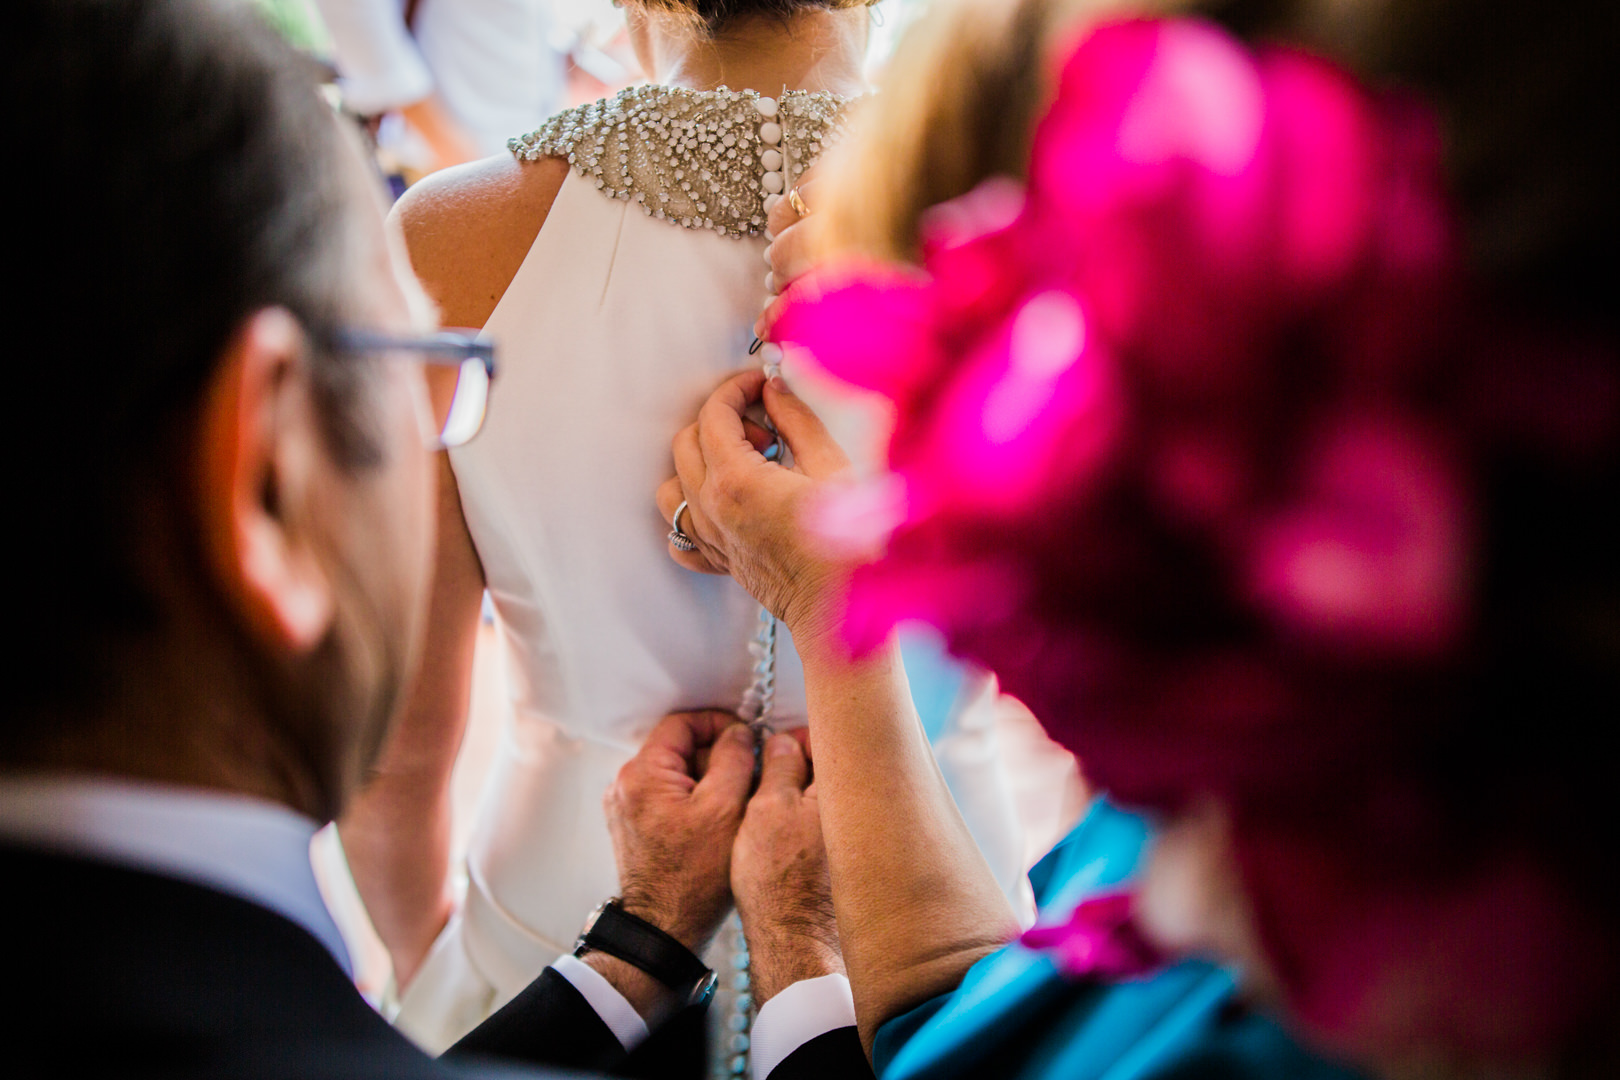 Boda-Catedral-Jaen-Hamburgo-Maria-David-engagement-Rafael-Torres-fotografo-bodas-sevilla-madrid-barcelona-wedding-photographer--15.jpg